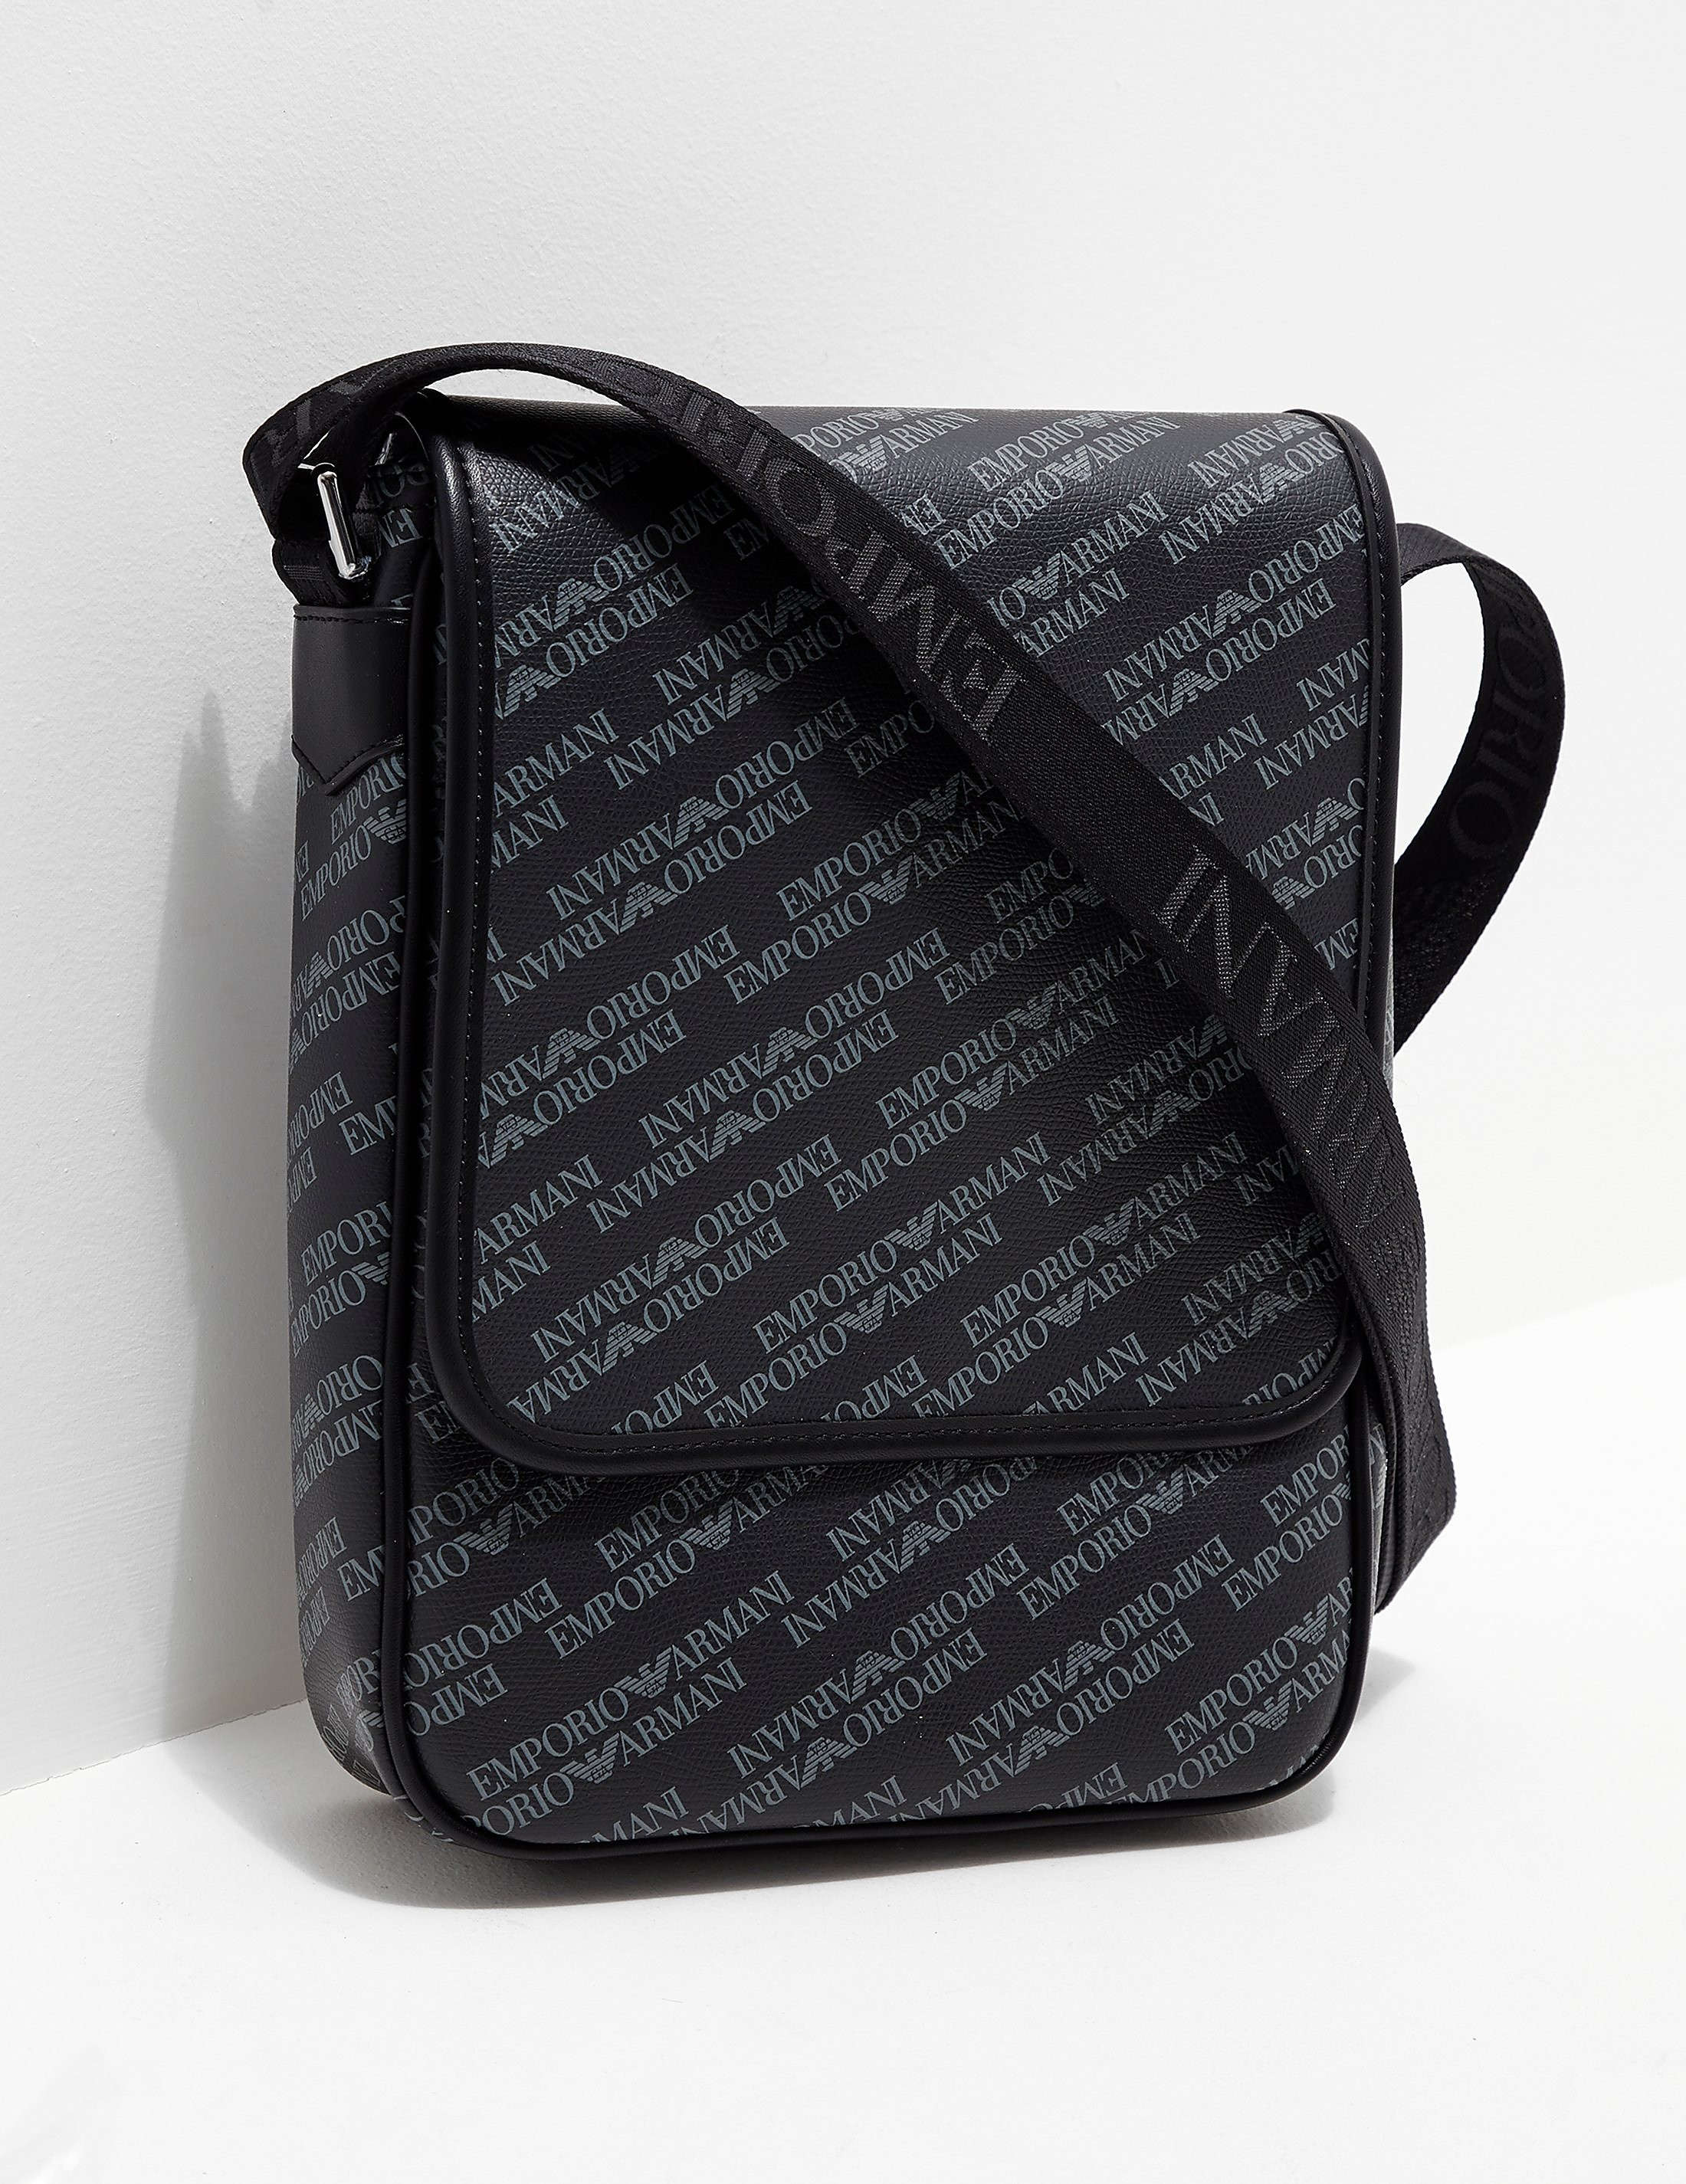 Emporio Armani All Over Print Small Item Bag